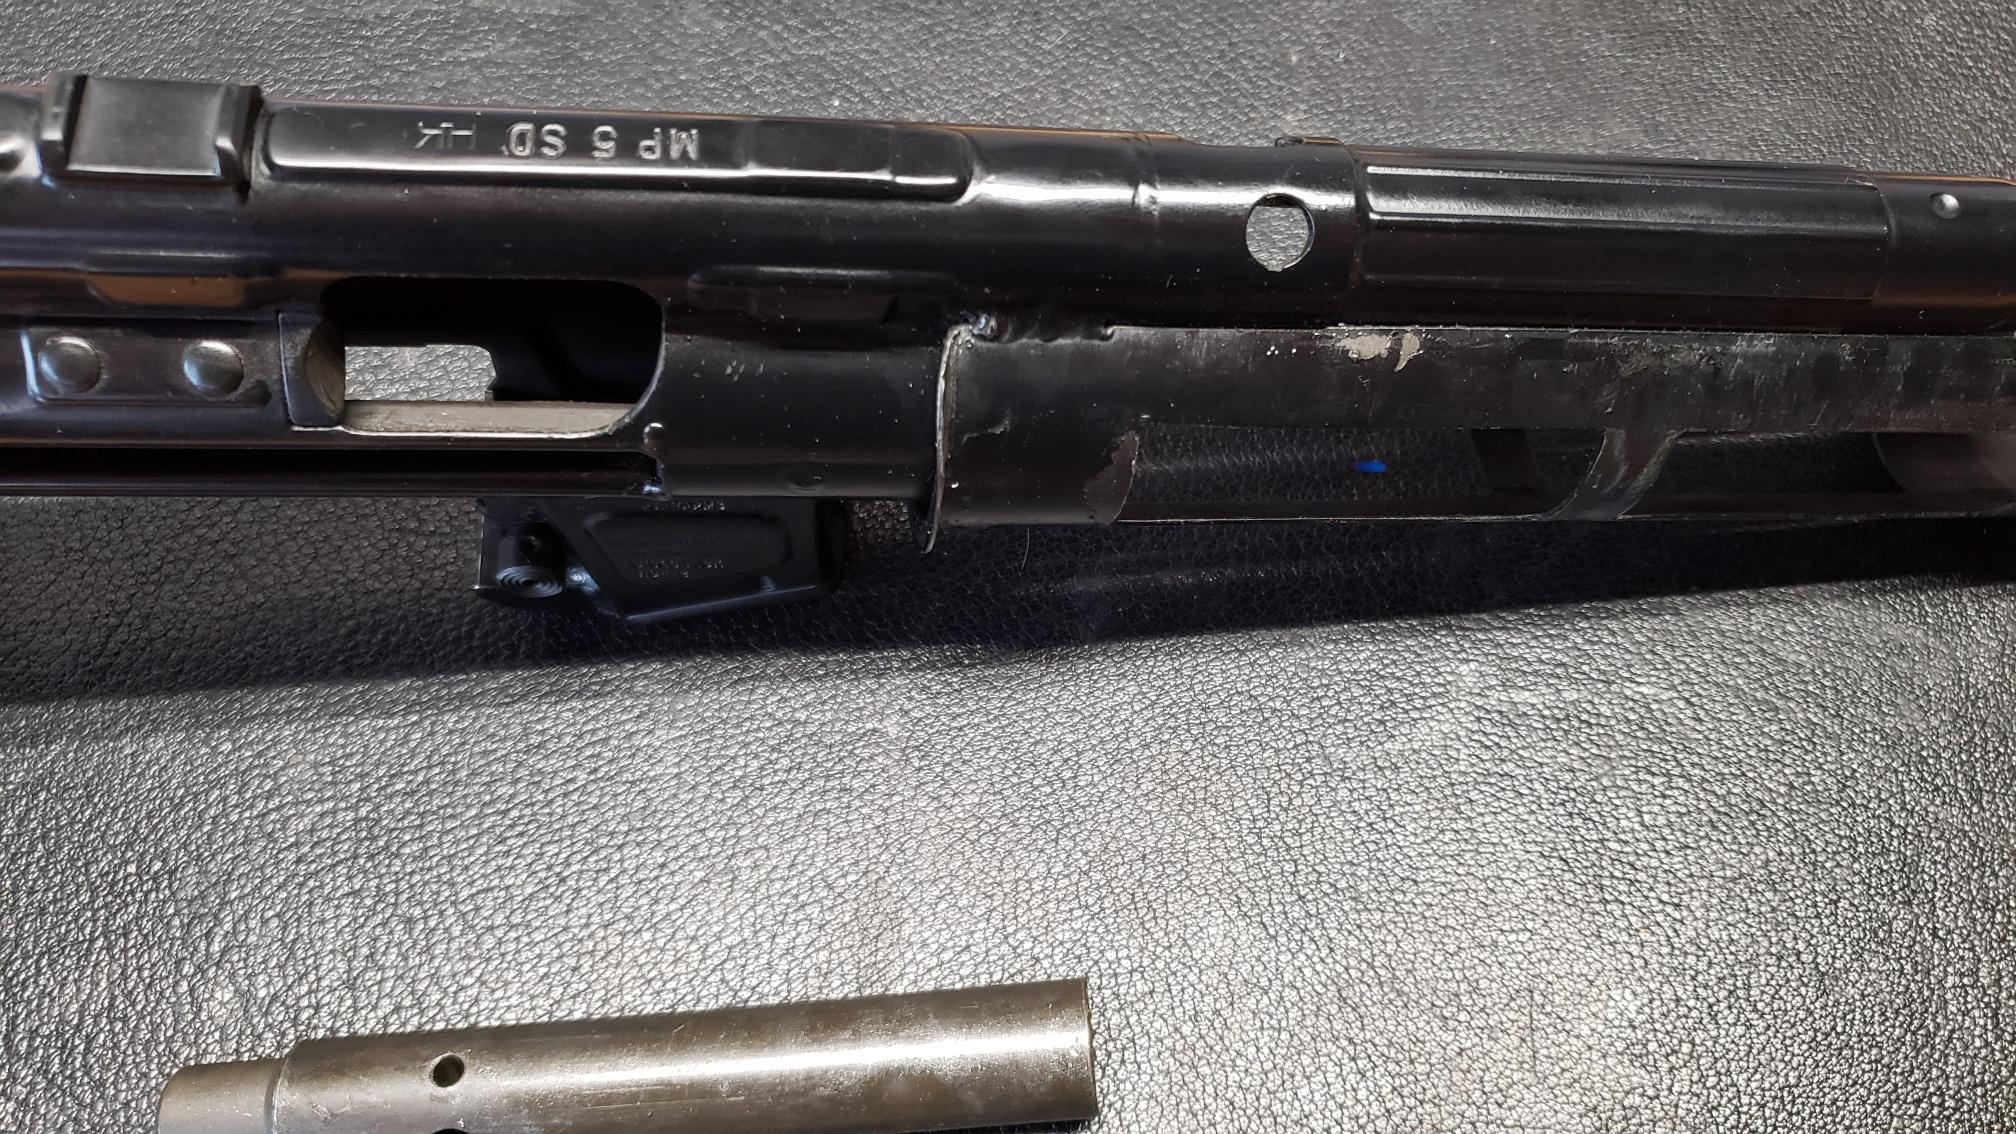 MP5 blues - broken carrier and stuck locking piece-20200616_113821_resized.jpg